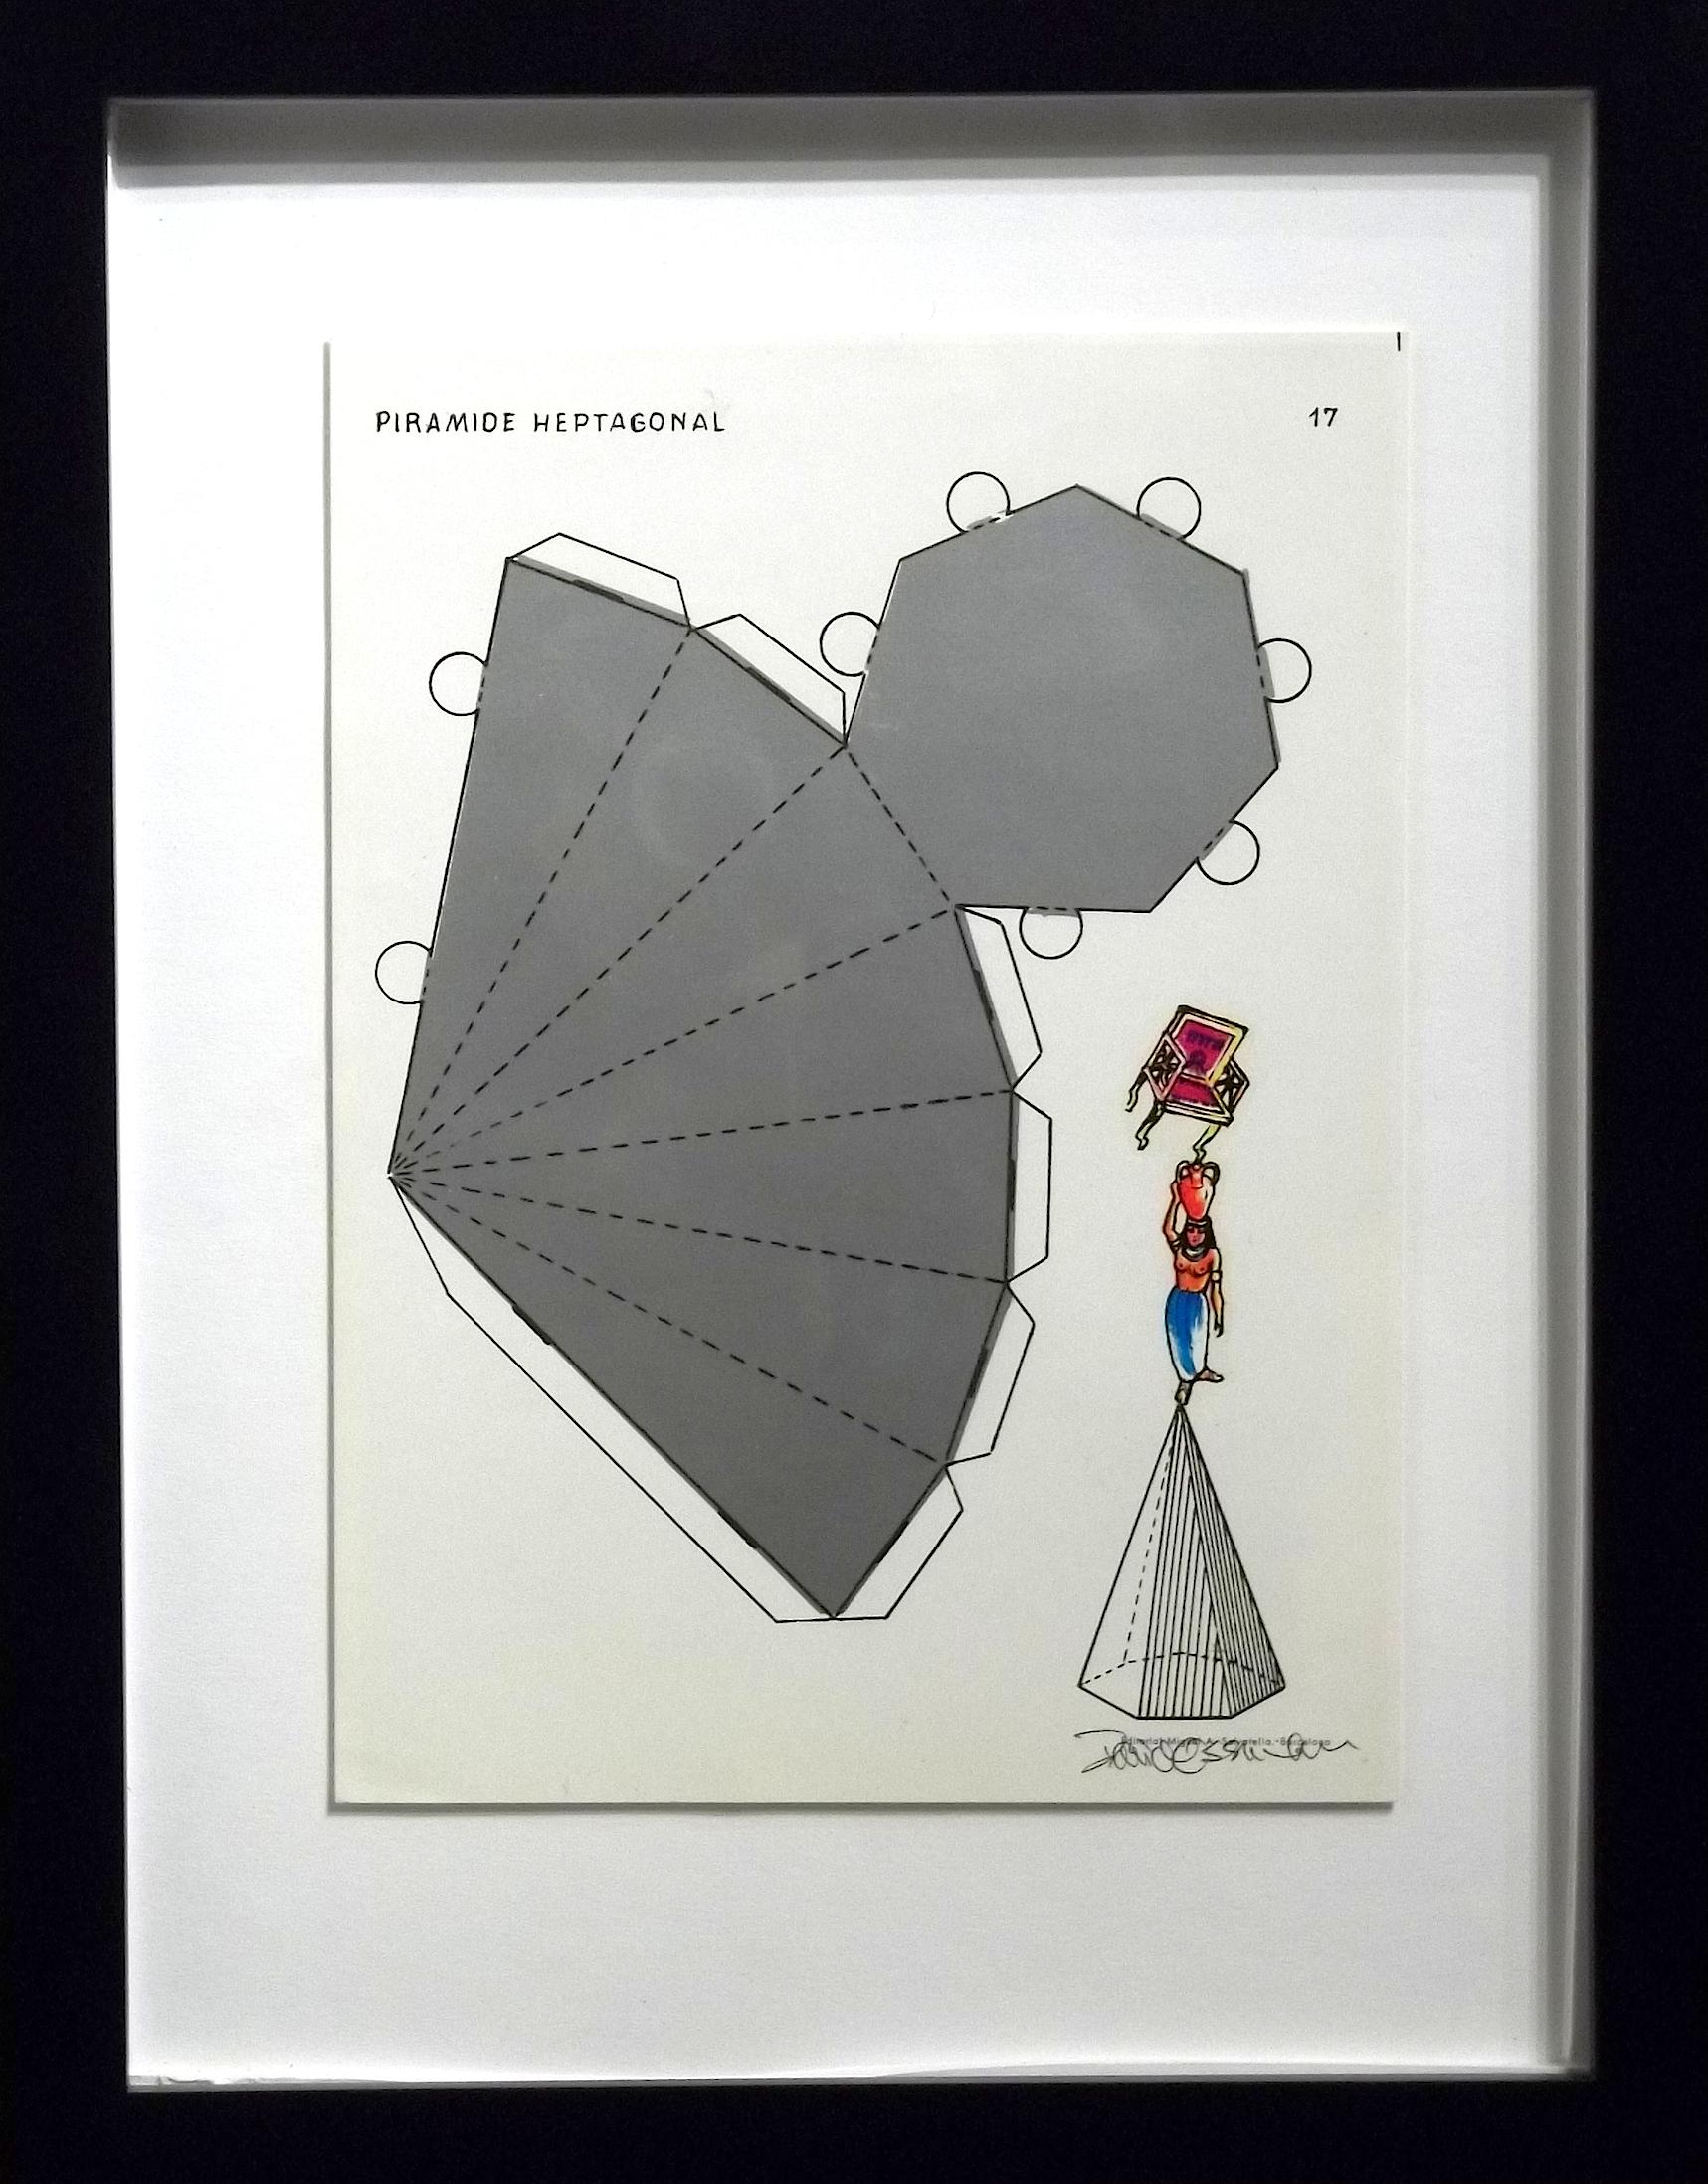 "Piramide Heptagonal  vintage Spanish geometry workbook, transfer figures  9 x 7""  framed $250"